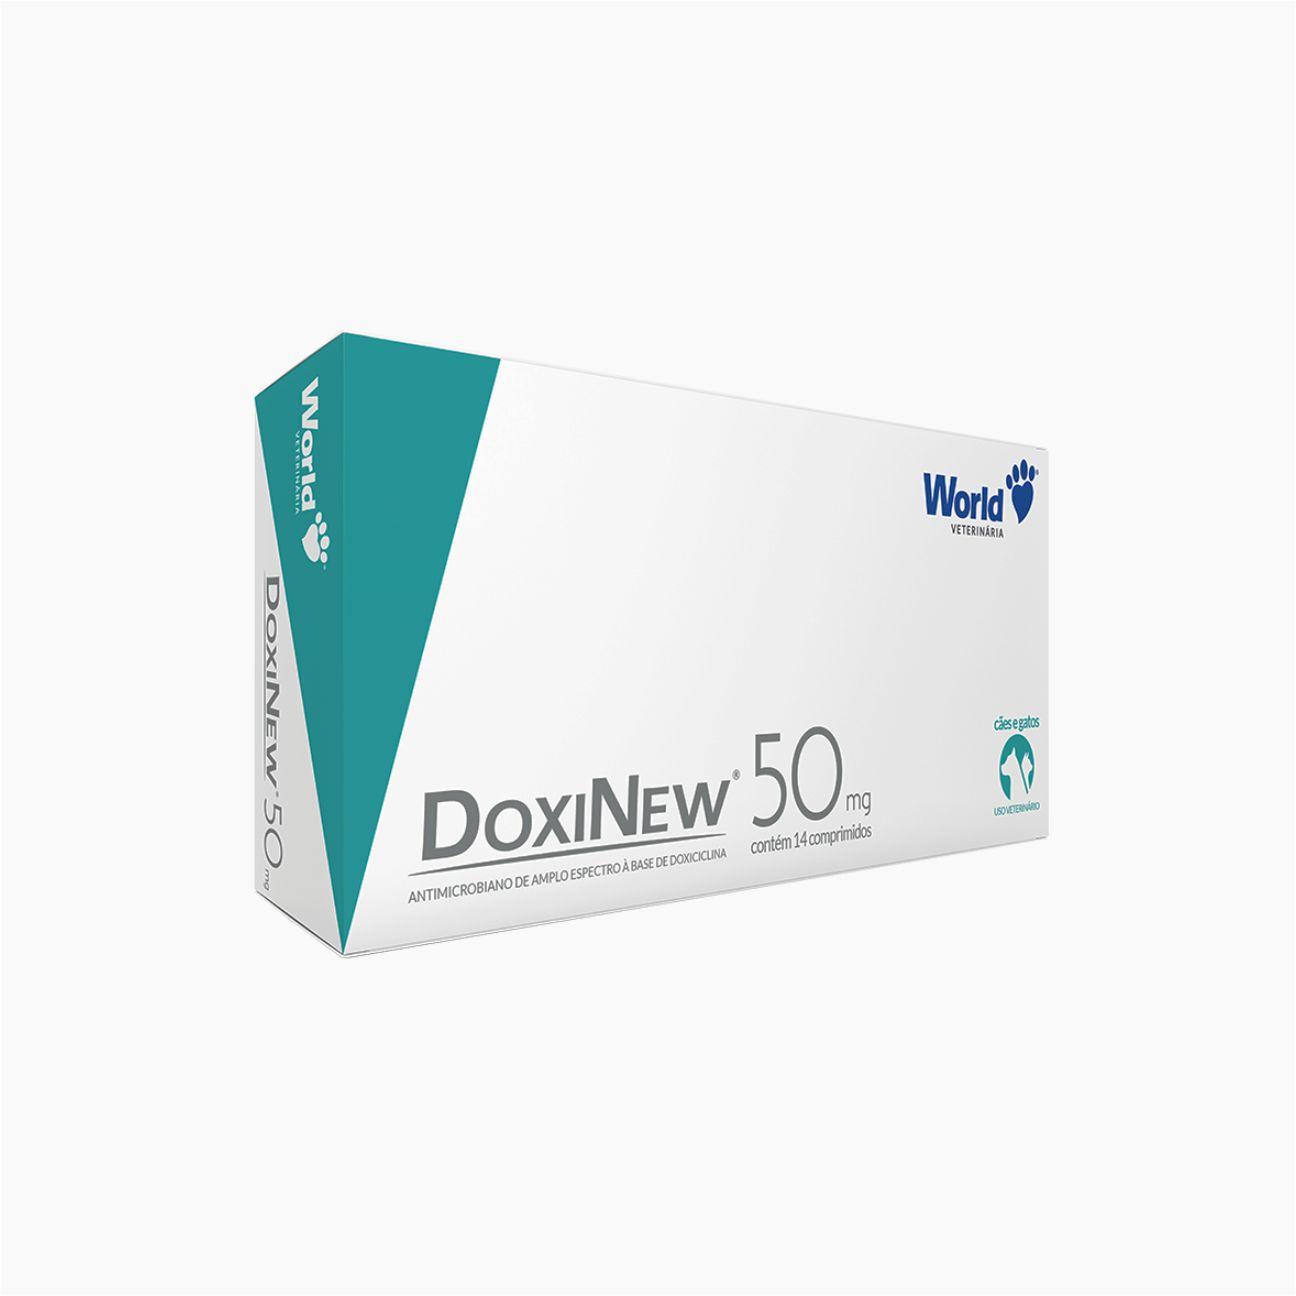 Doxinew 50mg